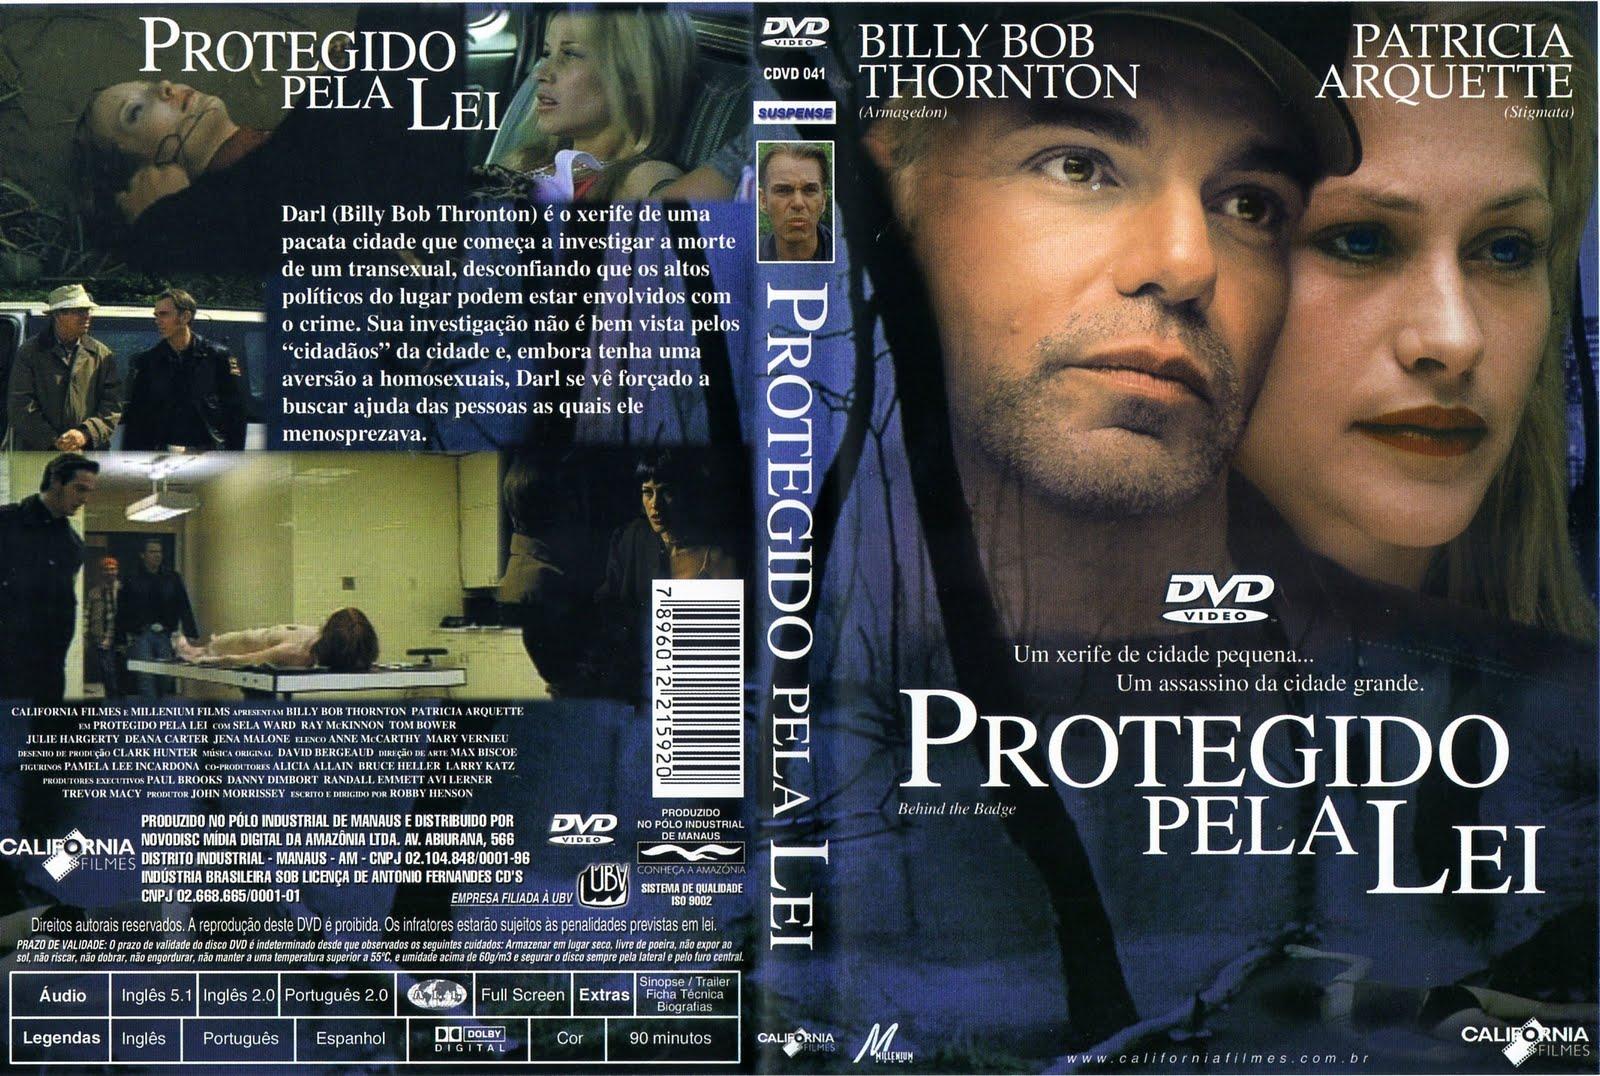 http://1.bp.blogspot.com/_56N_enXK-4o/TS21eIy5HuI/AAAAAAAAAn8/TROKl8HXaSI/s1600/Protegido%2BPela%2BLei.jpg